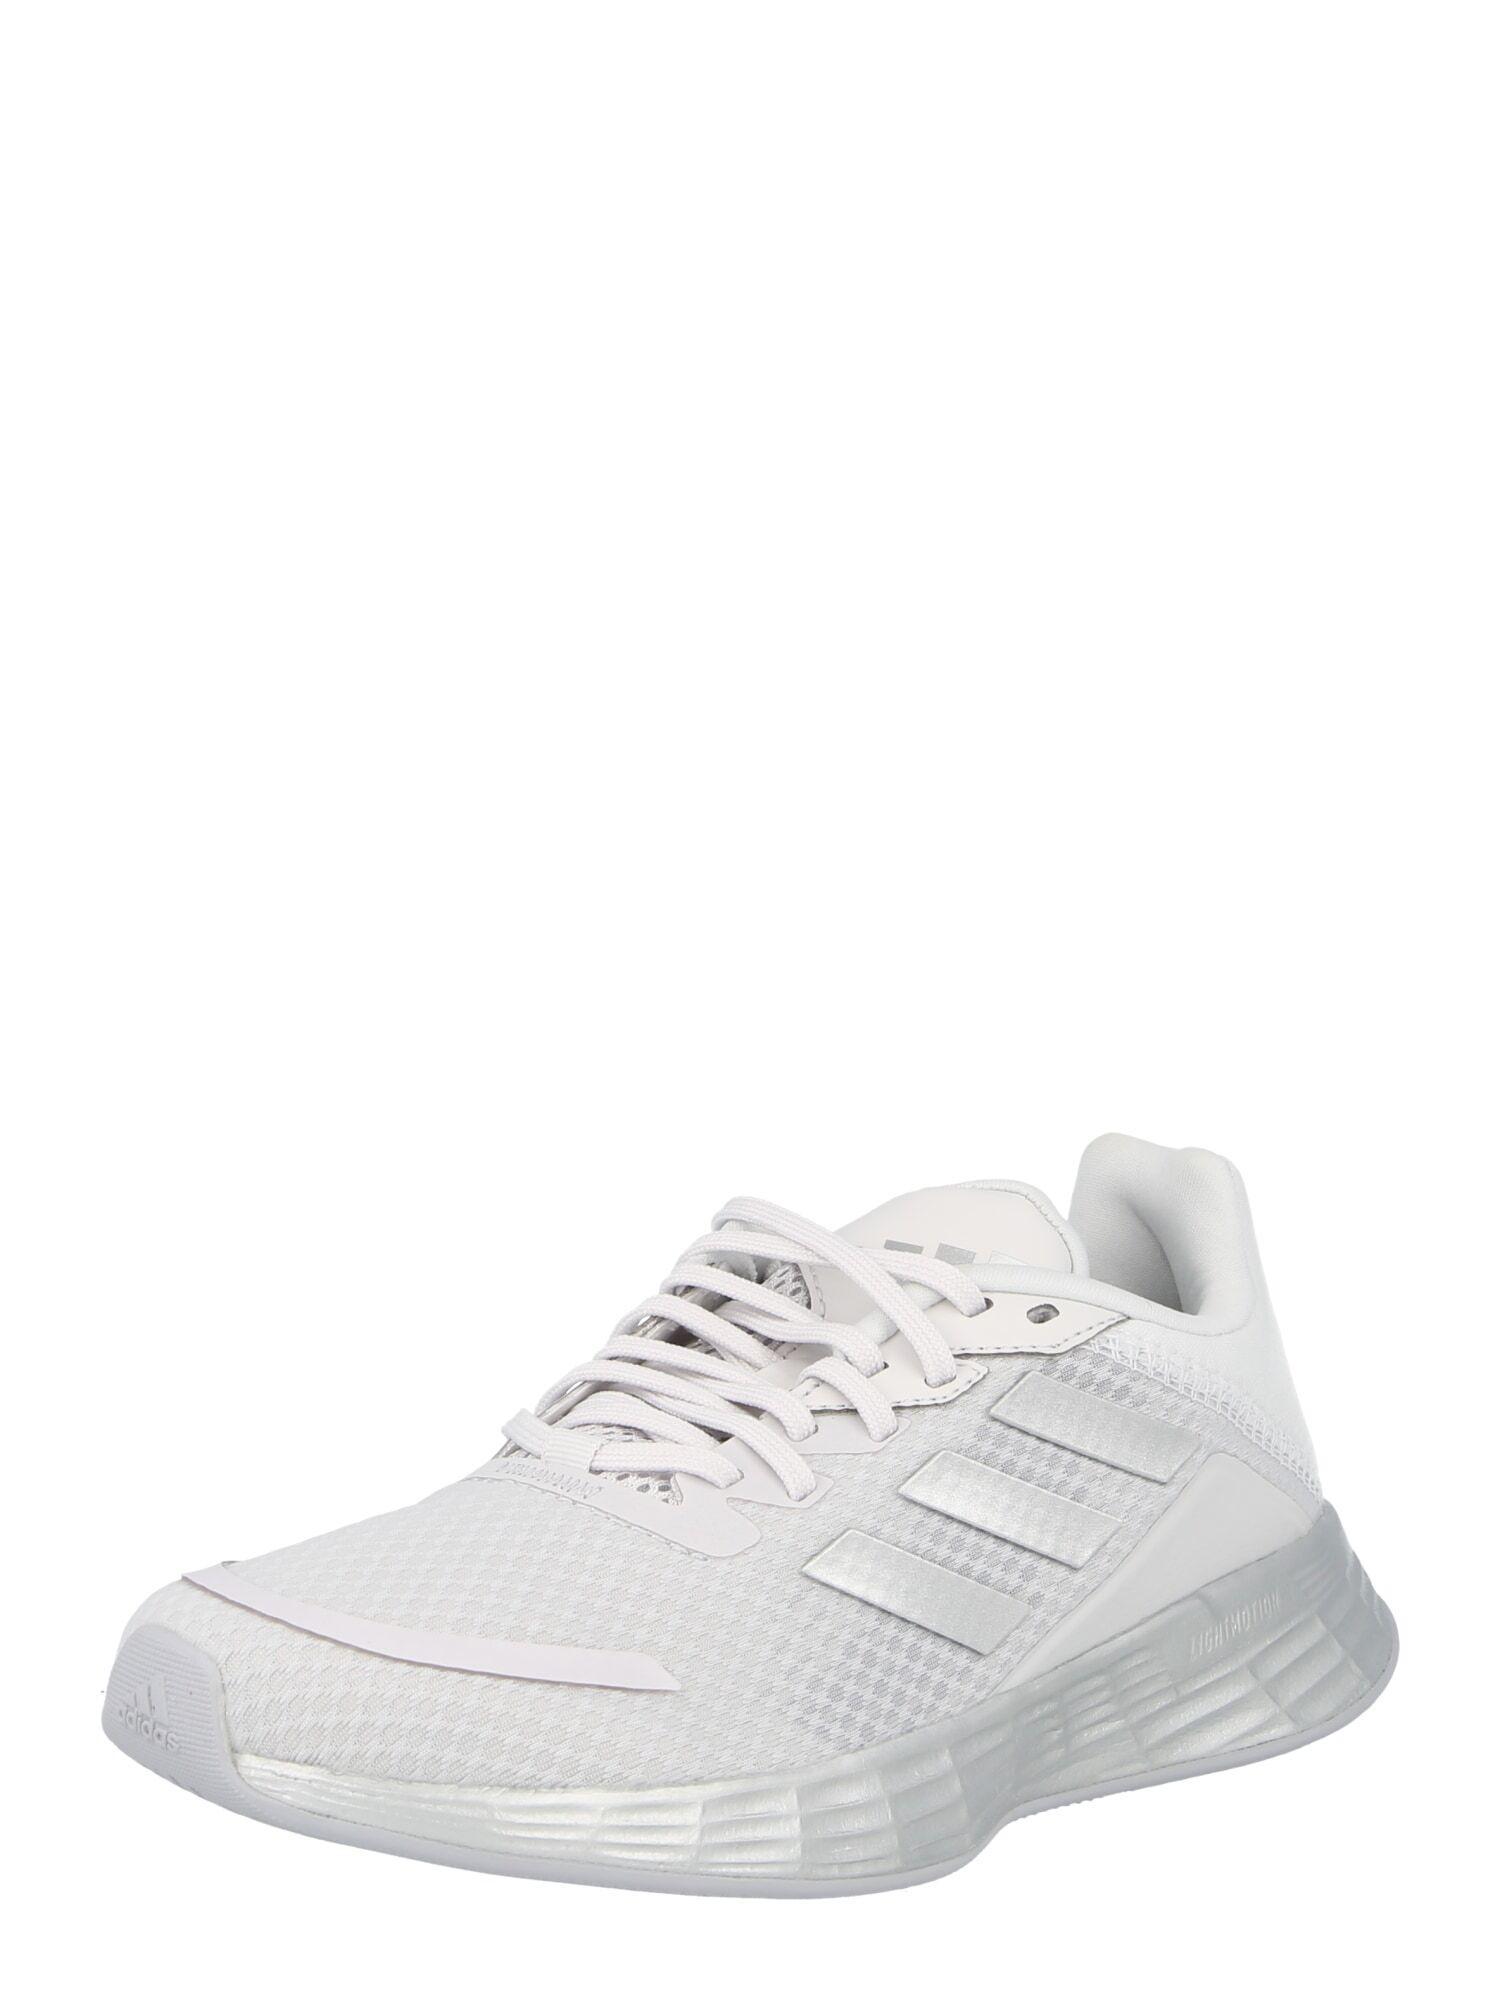 ADIDAS PERFORMANCE Chaussure de course 'Duramo'  - Blanc - Taille: 6.5 - male